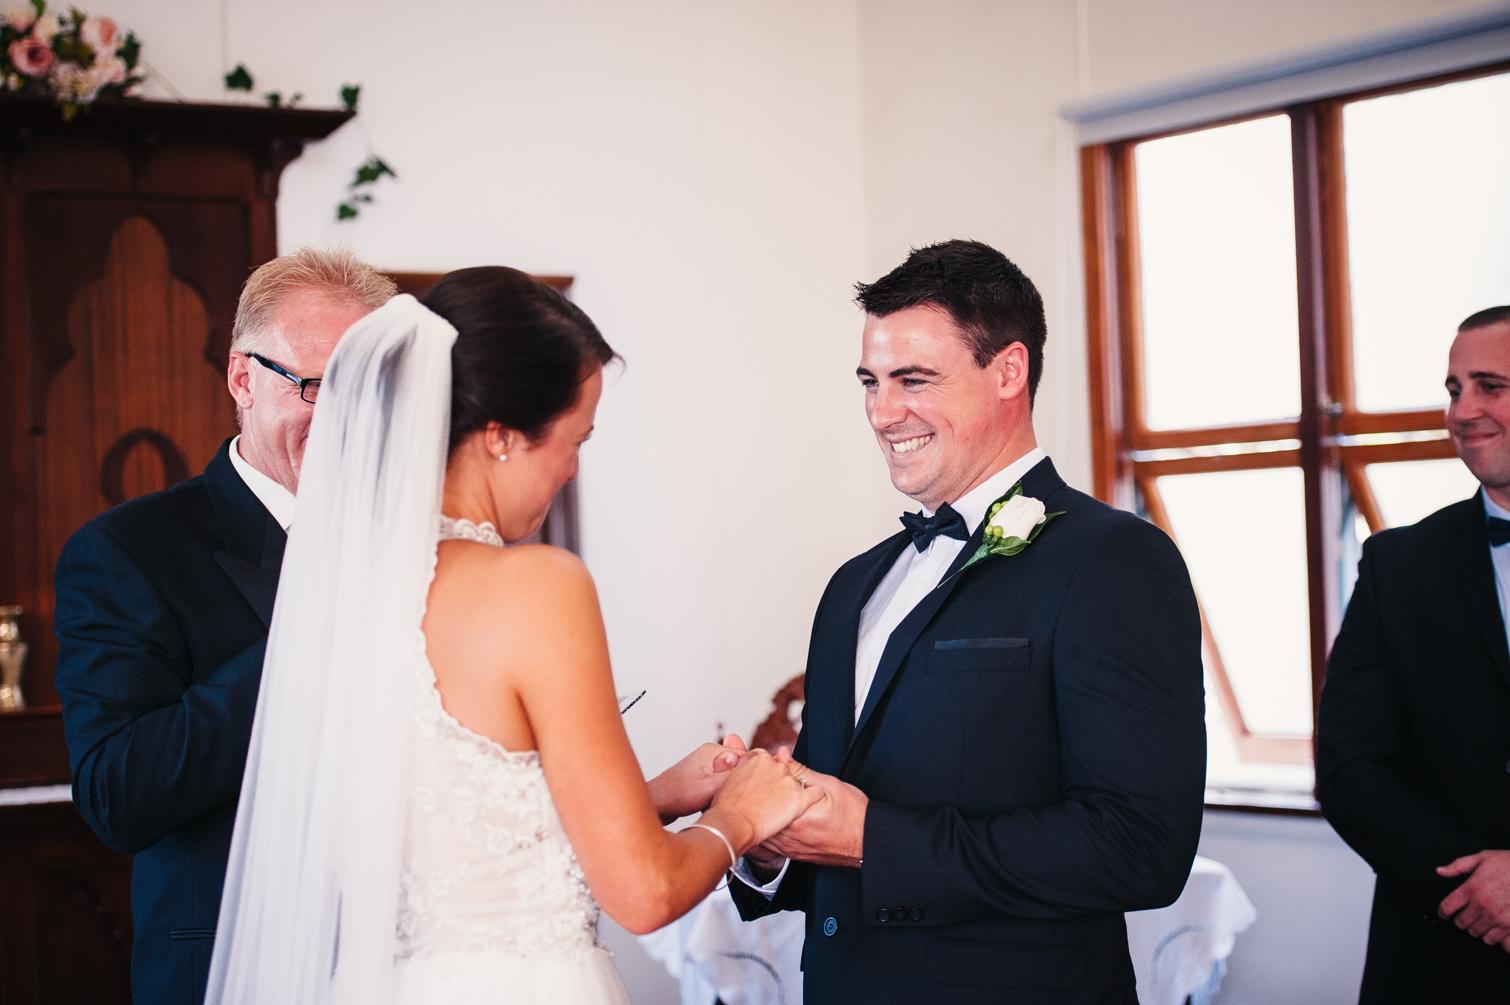 Osteria wedding_New Black Studios 29.jpg